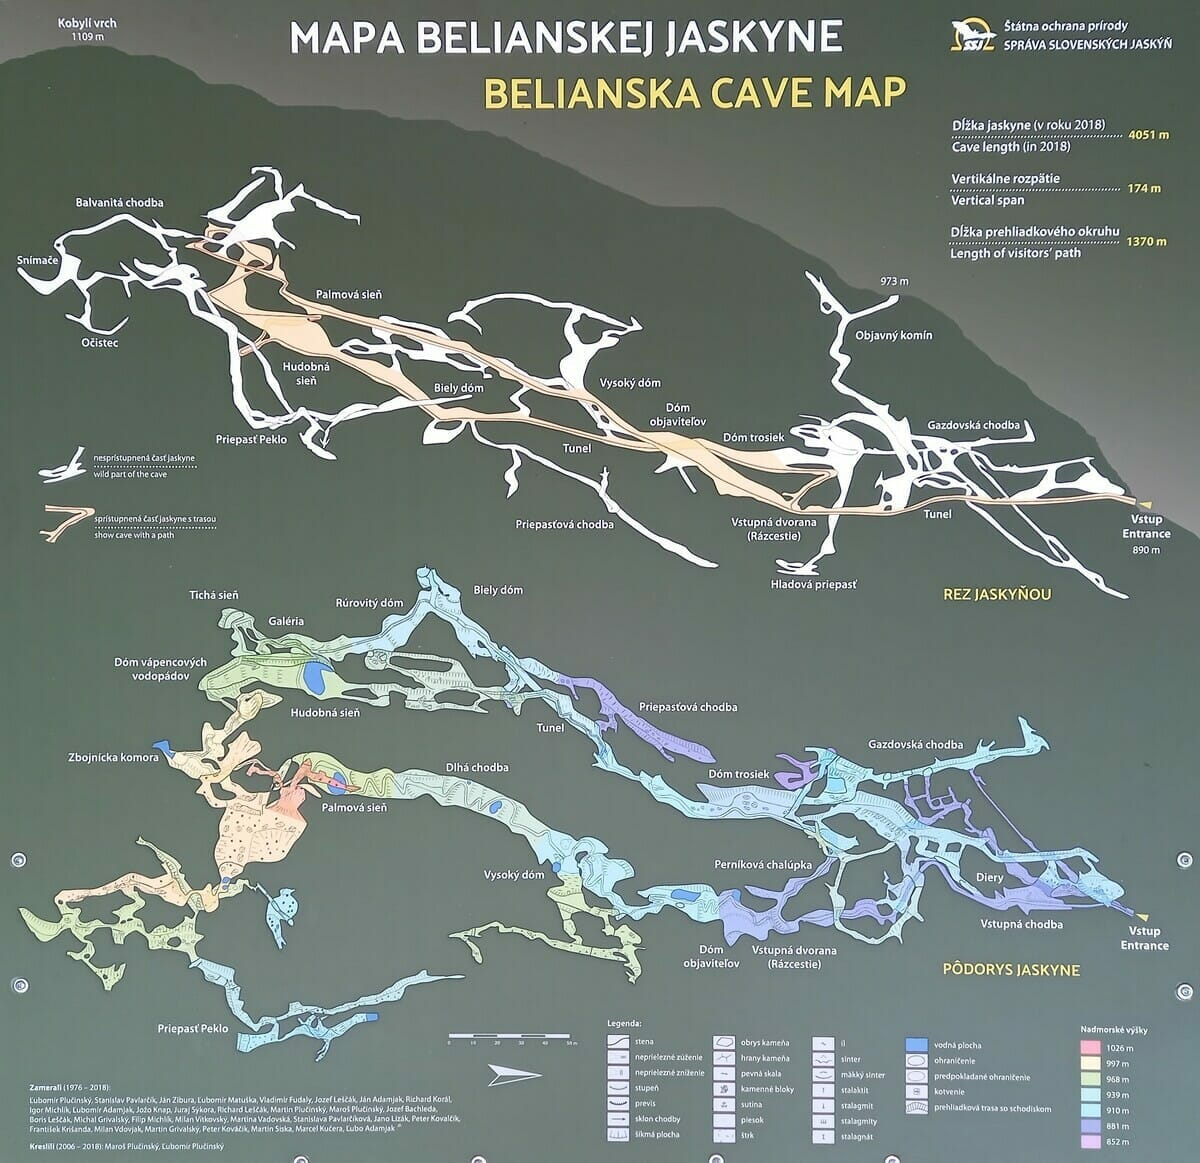 Mapa Belianskej jaskyne